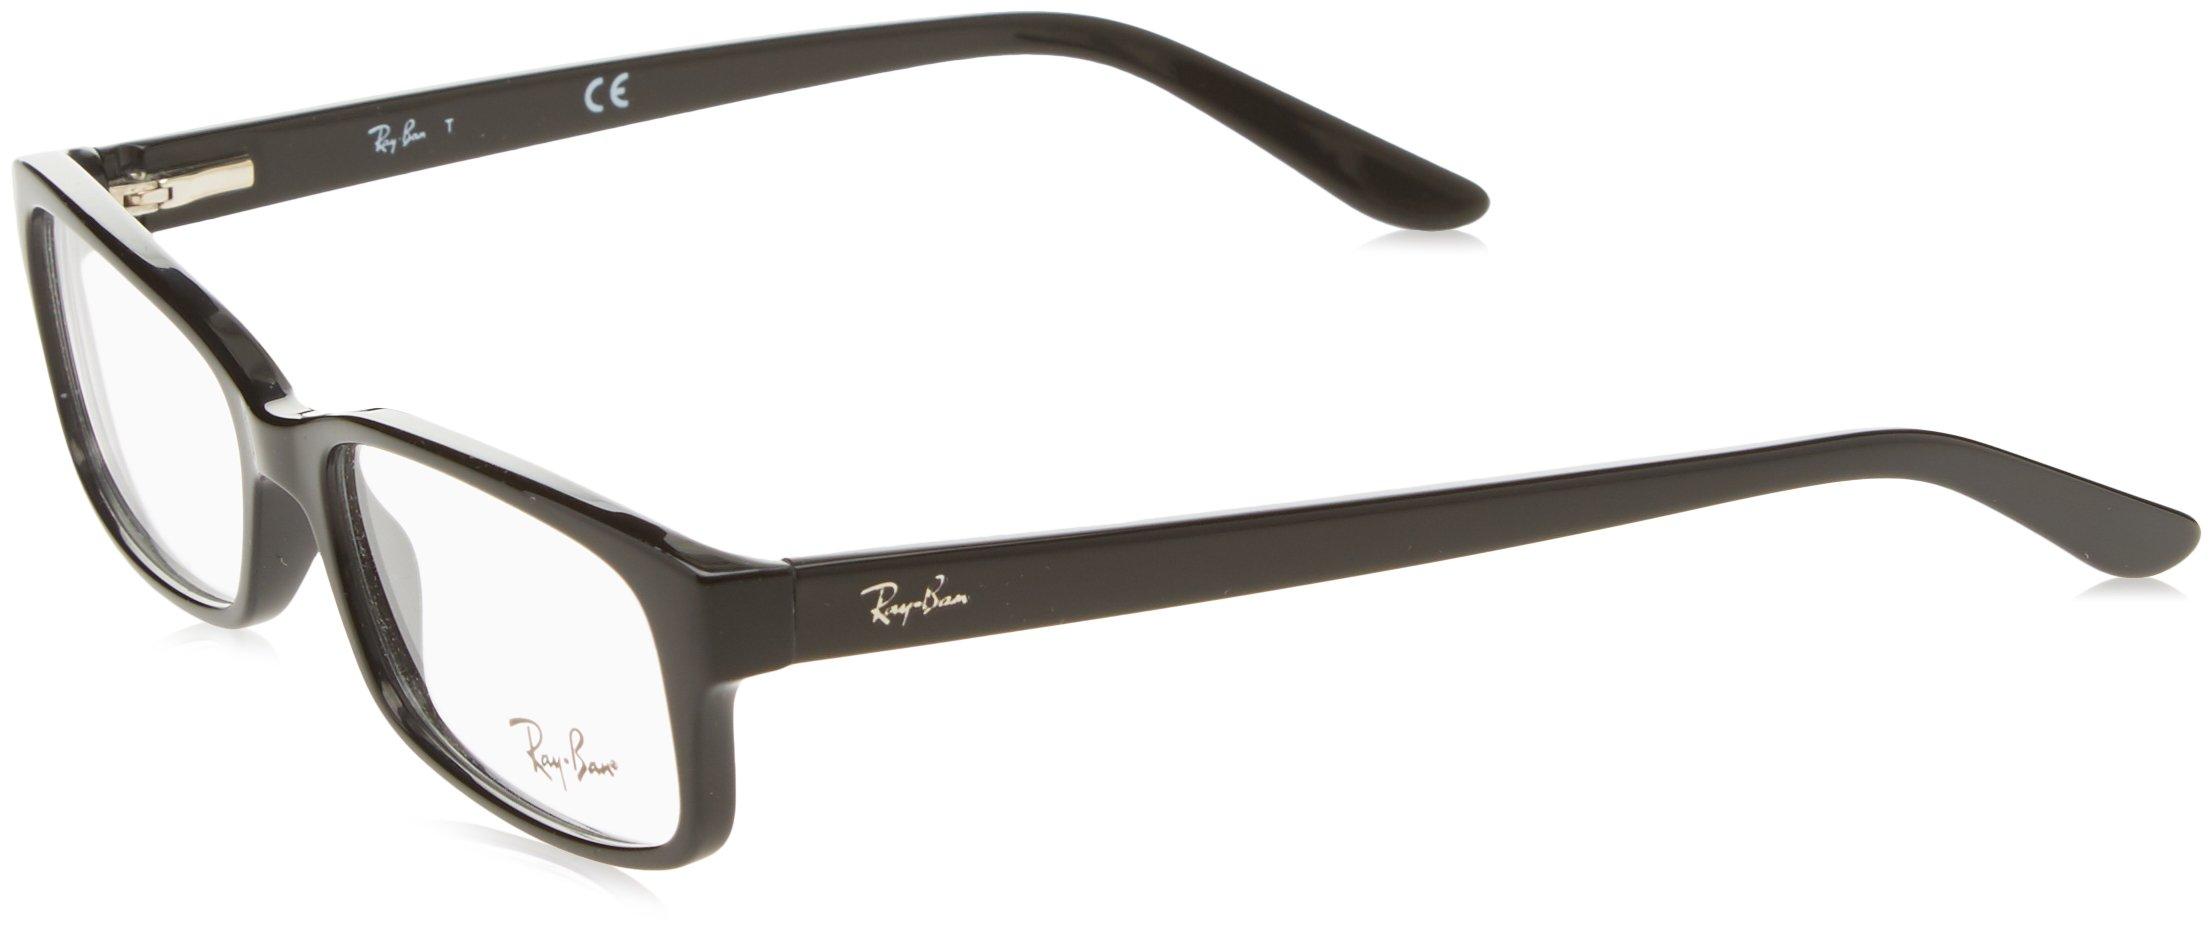 Ray-Ban Rx5187 Rectangular Eyeglasses,Shiny Black,50 mm